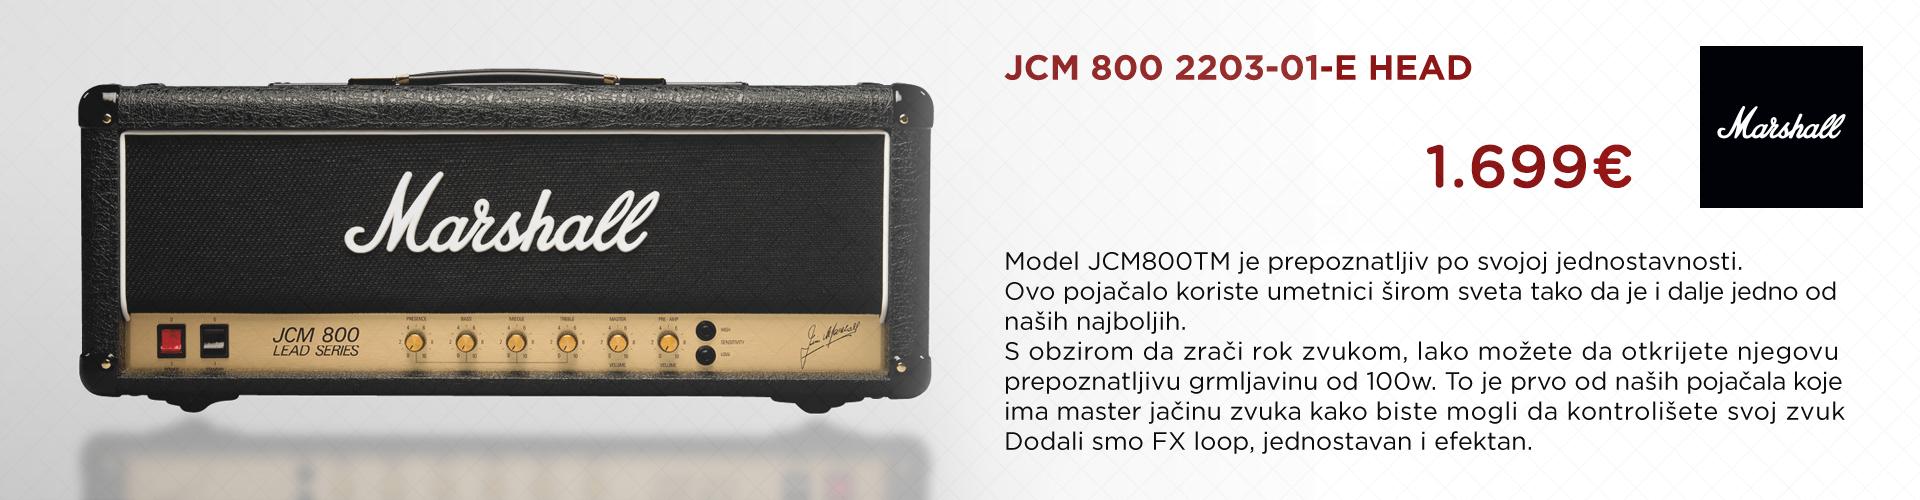 Marshall JCM800